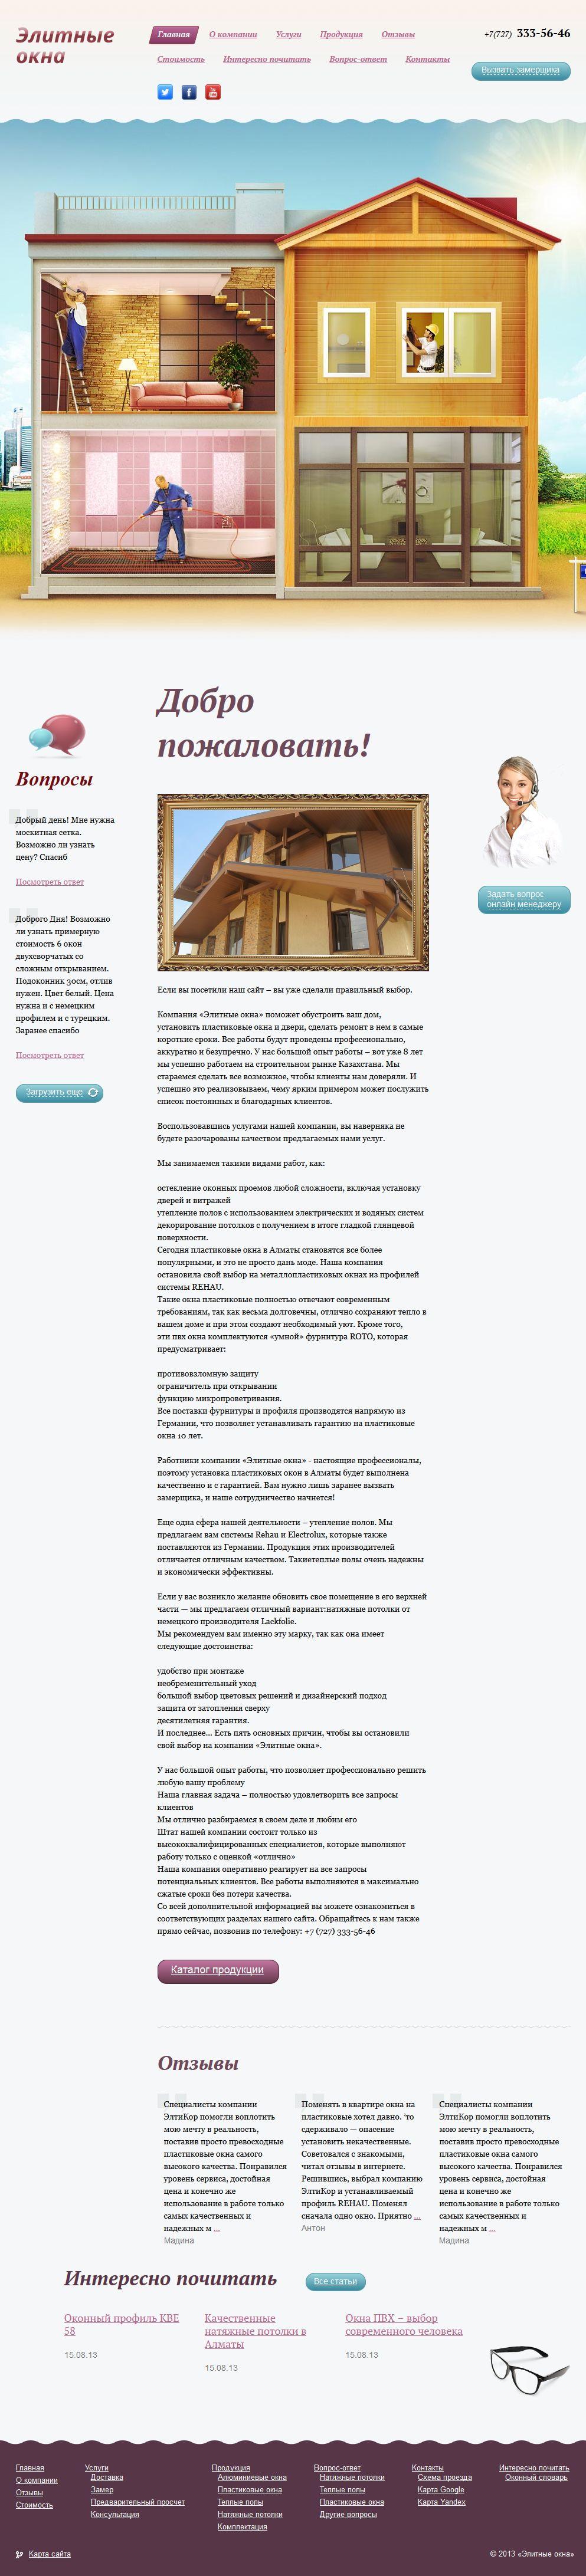 Разработка сайтов Астана